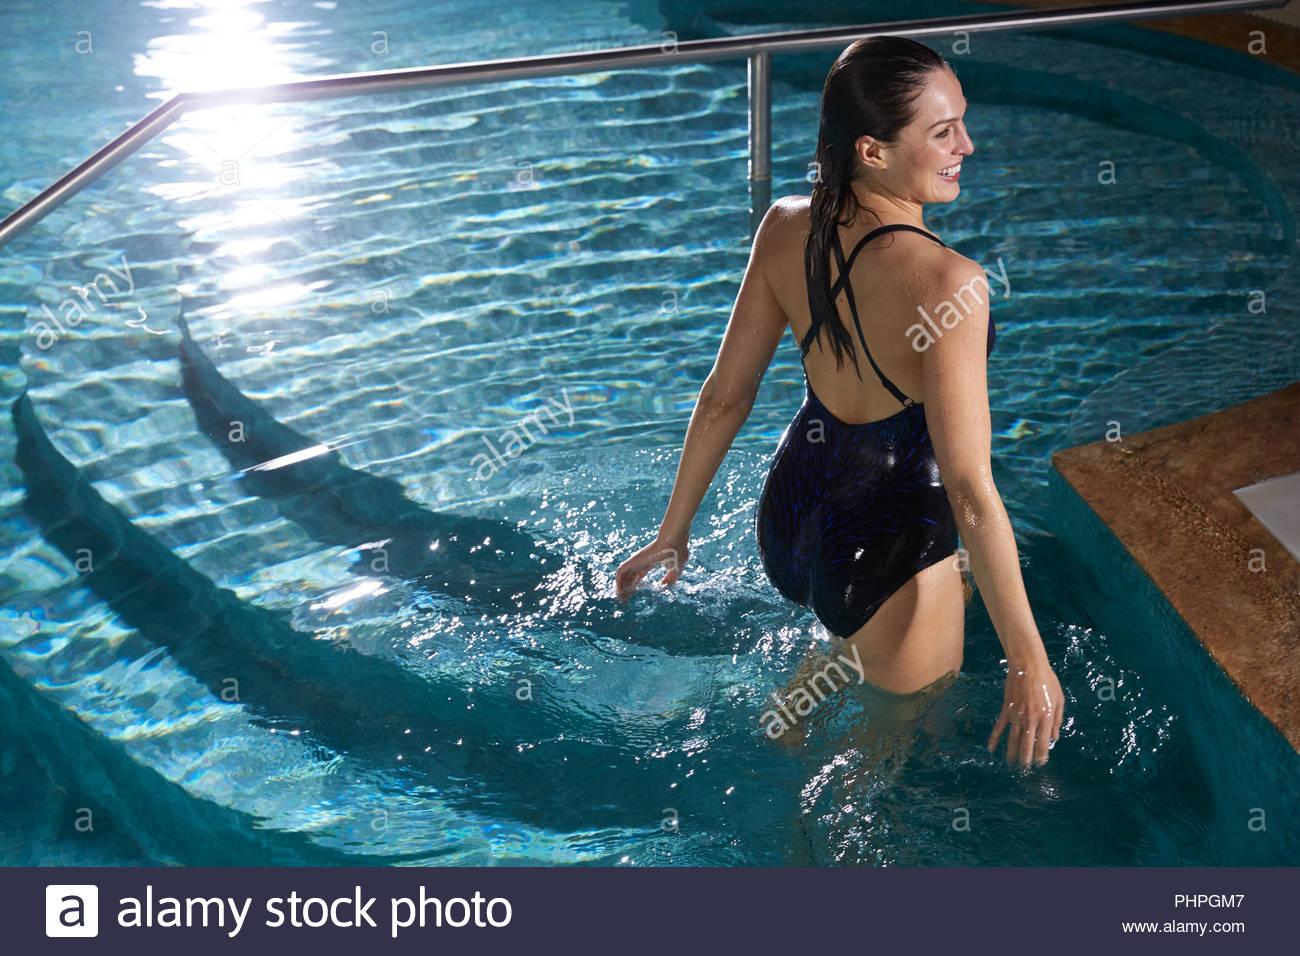 Woman wearing black swimsuit standing in swimming pool Stock ...